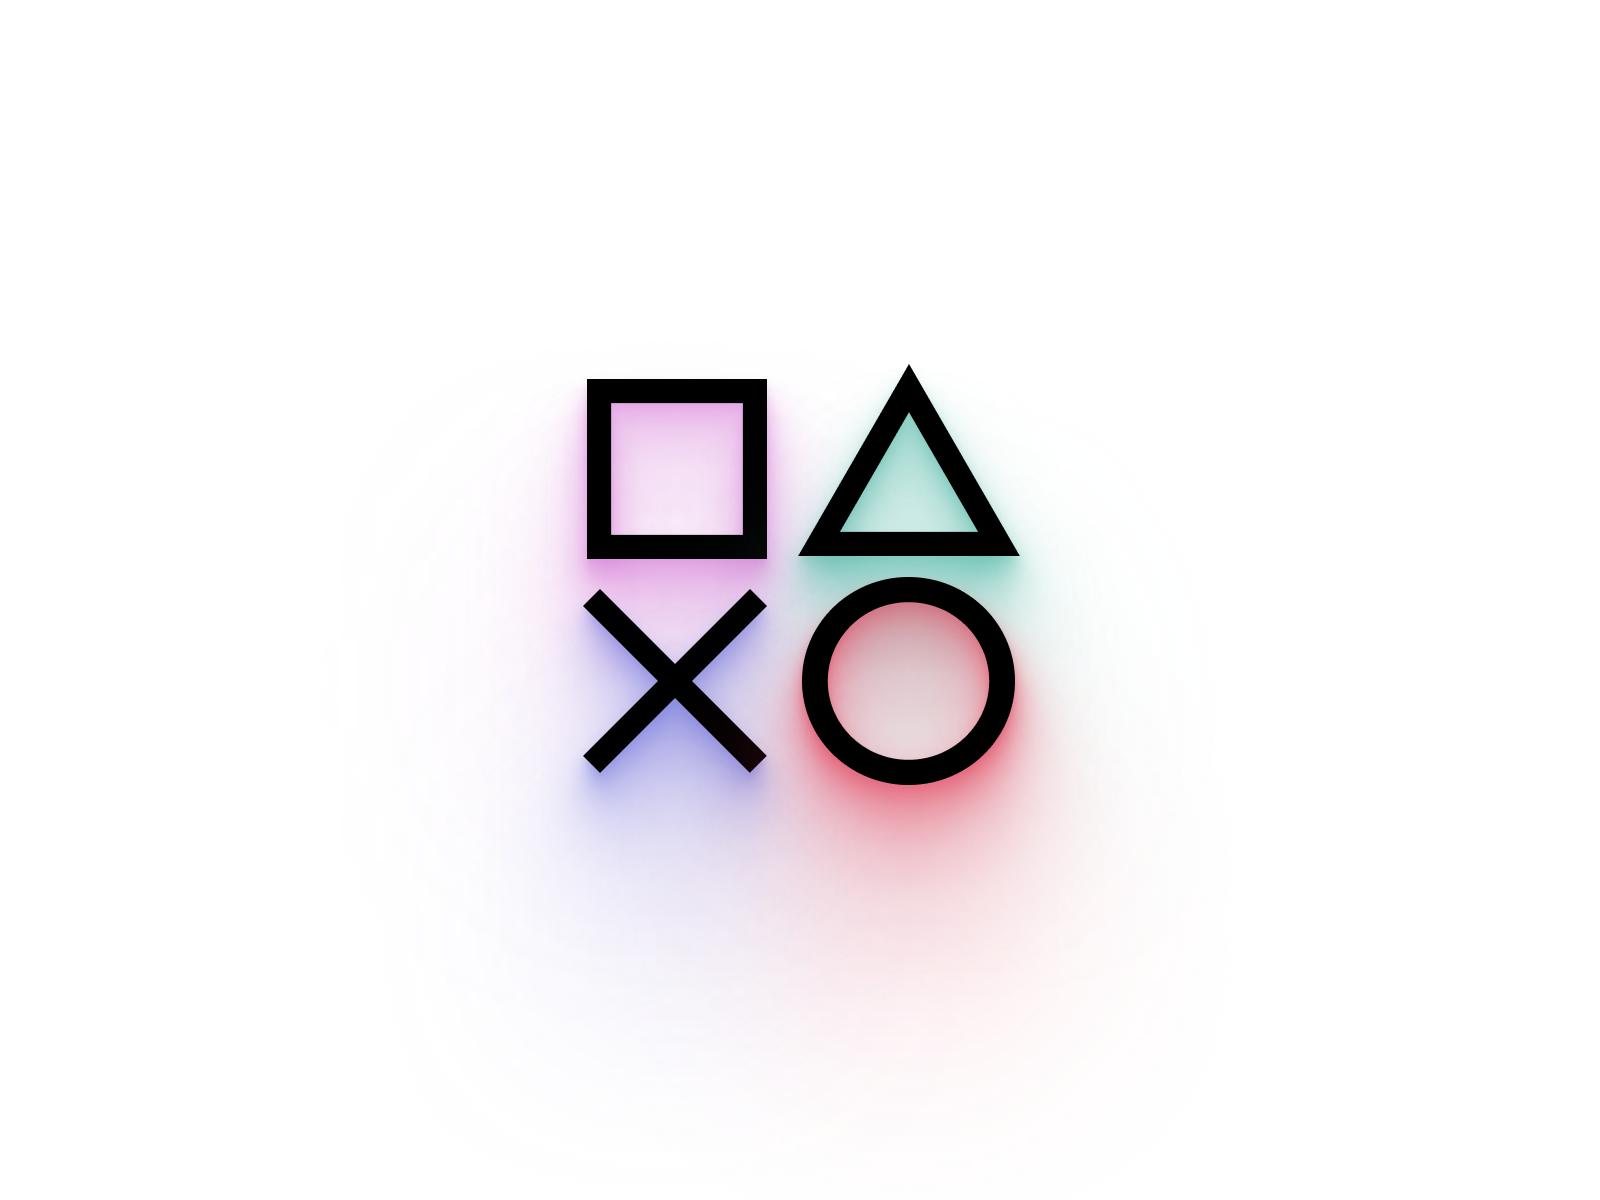 Playstation 4 Symbols Papel De Parede Lol Imagens Para Wallpaper Papel De Parede Games